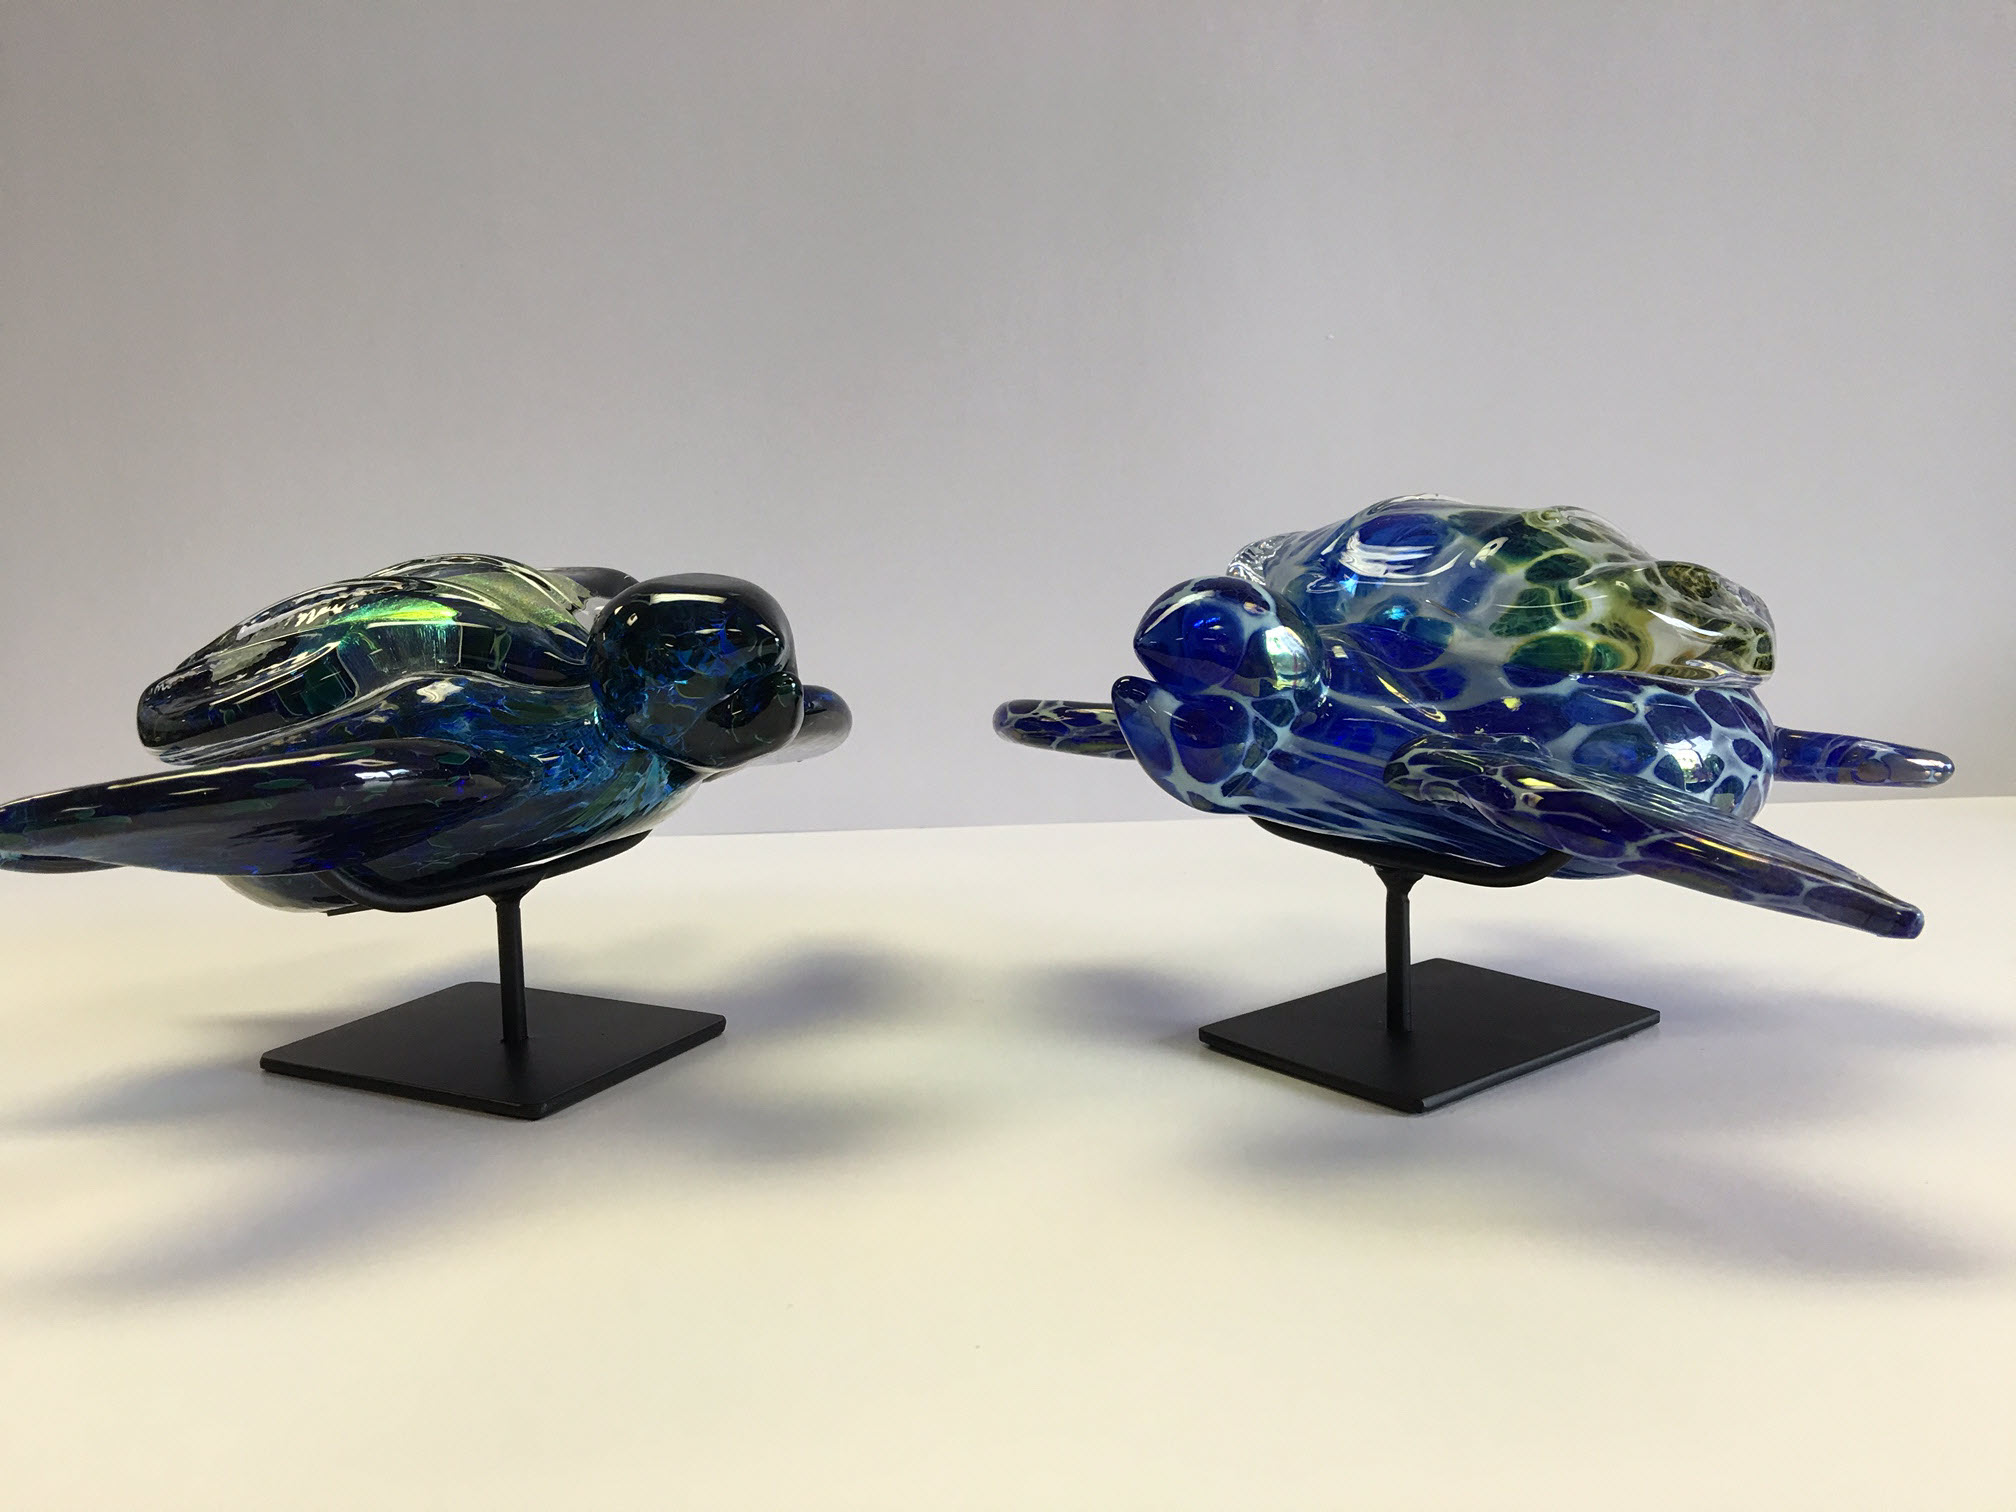 Taylor Backes Glass Art